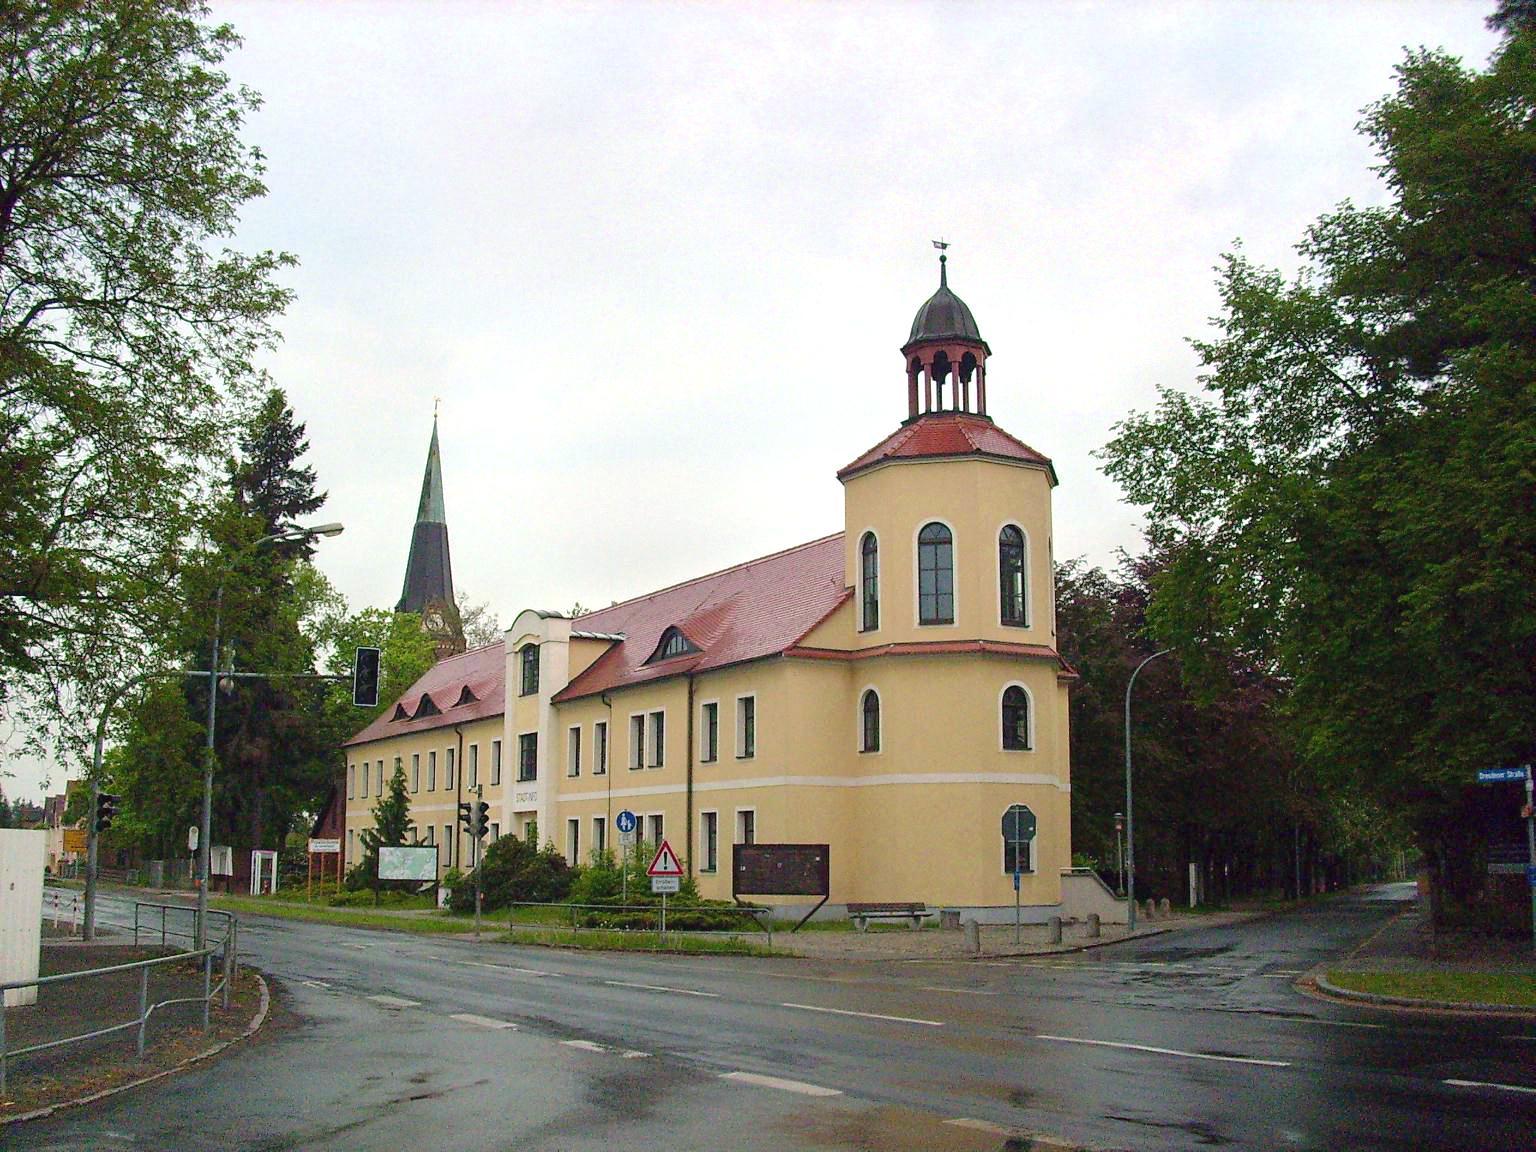 Bernsdorf (Oberlausitz)